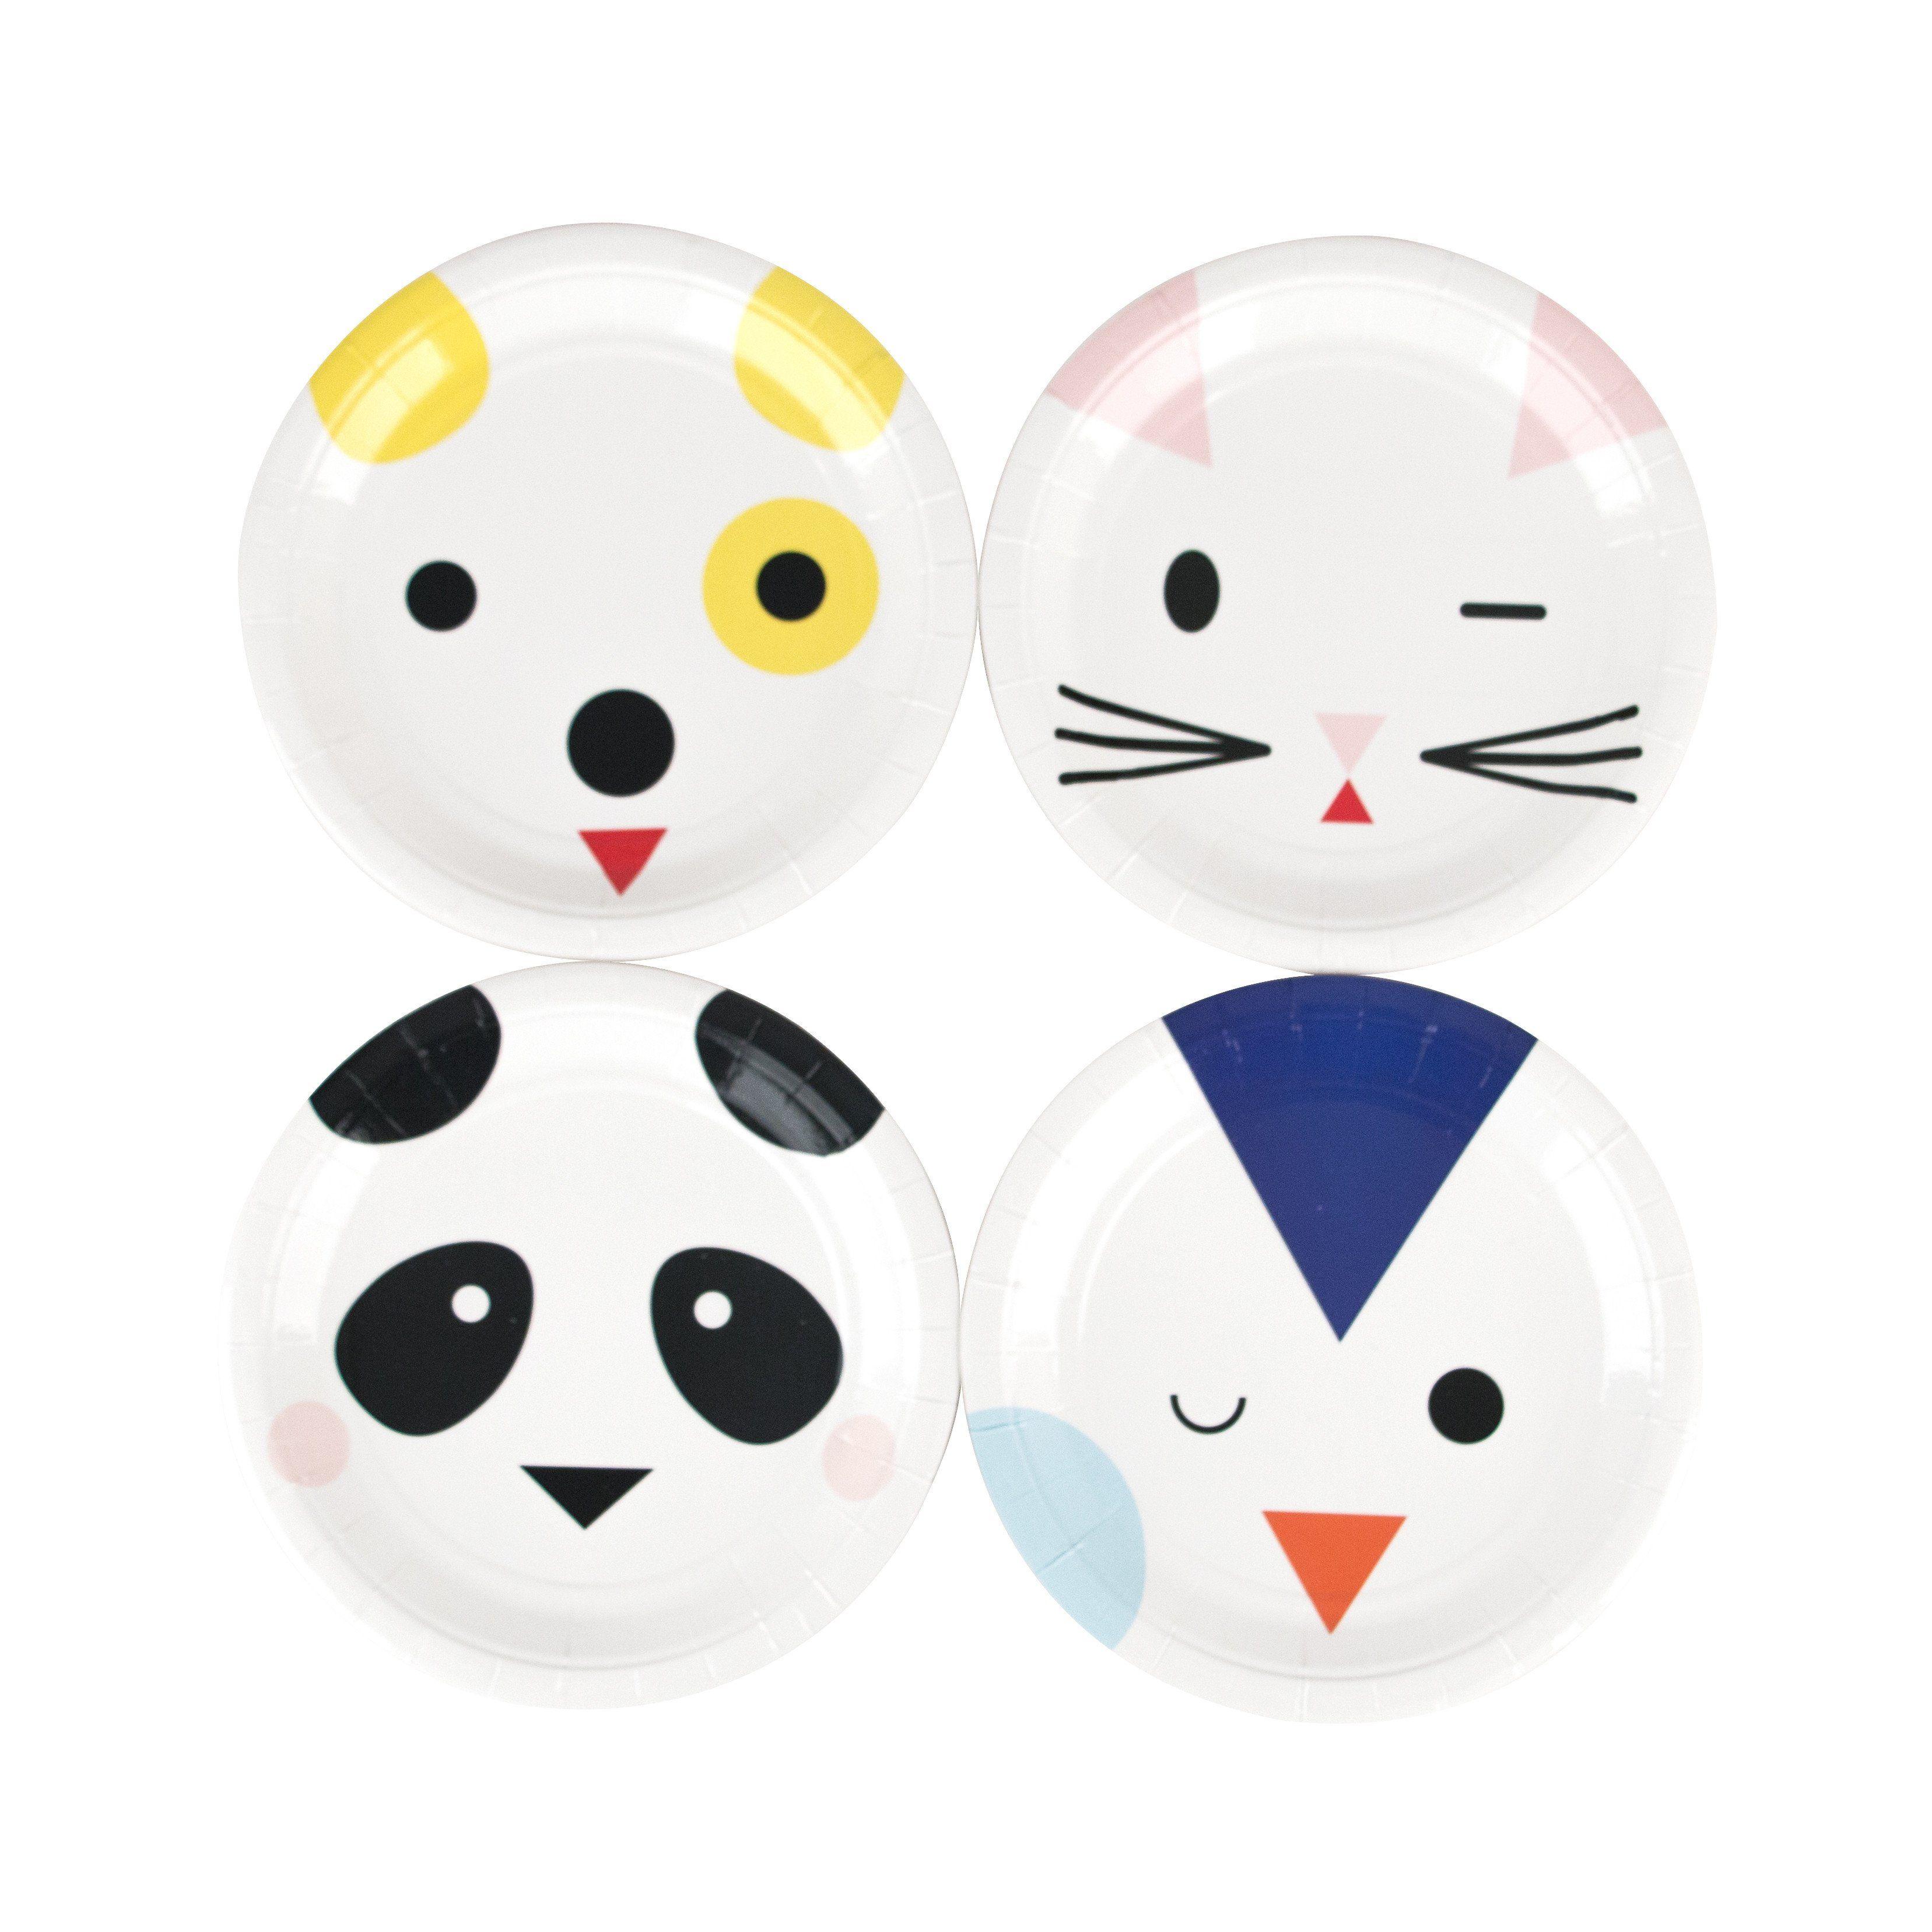 MINI ANIMALS Panda Cat Dog Party Tableware Napkins Plates Balloons